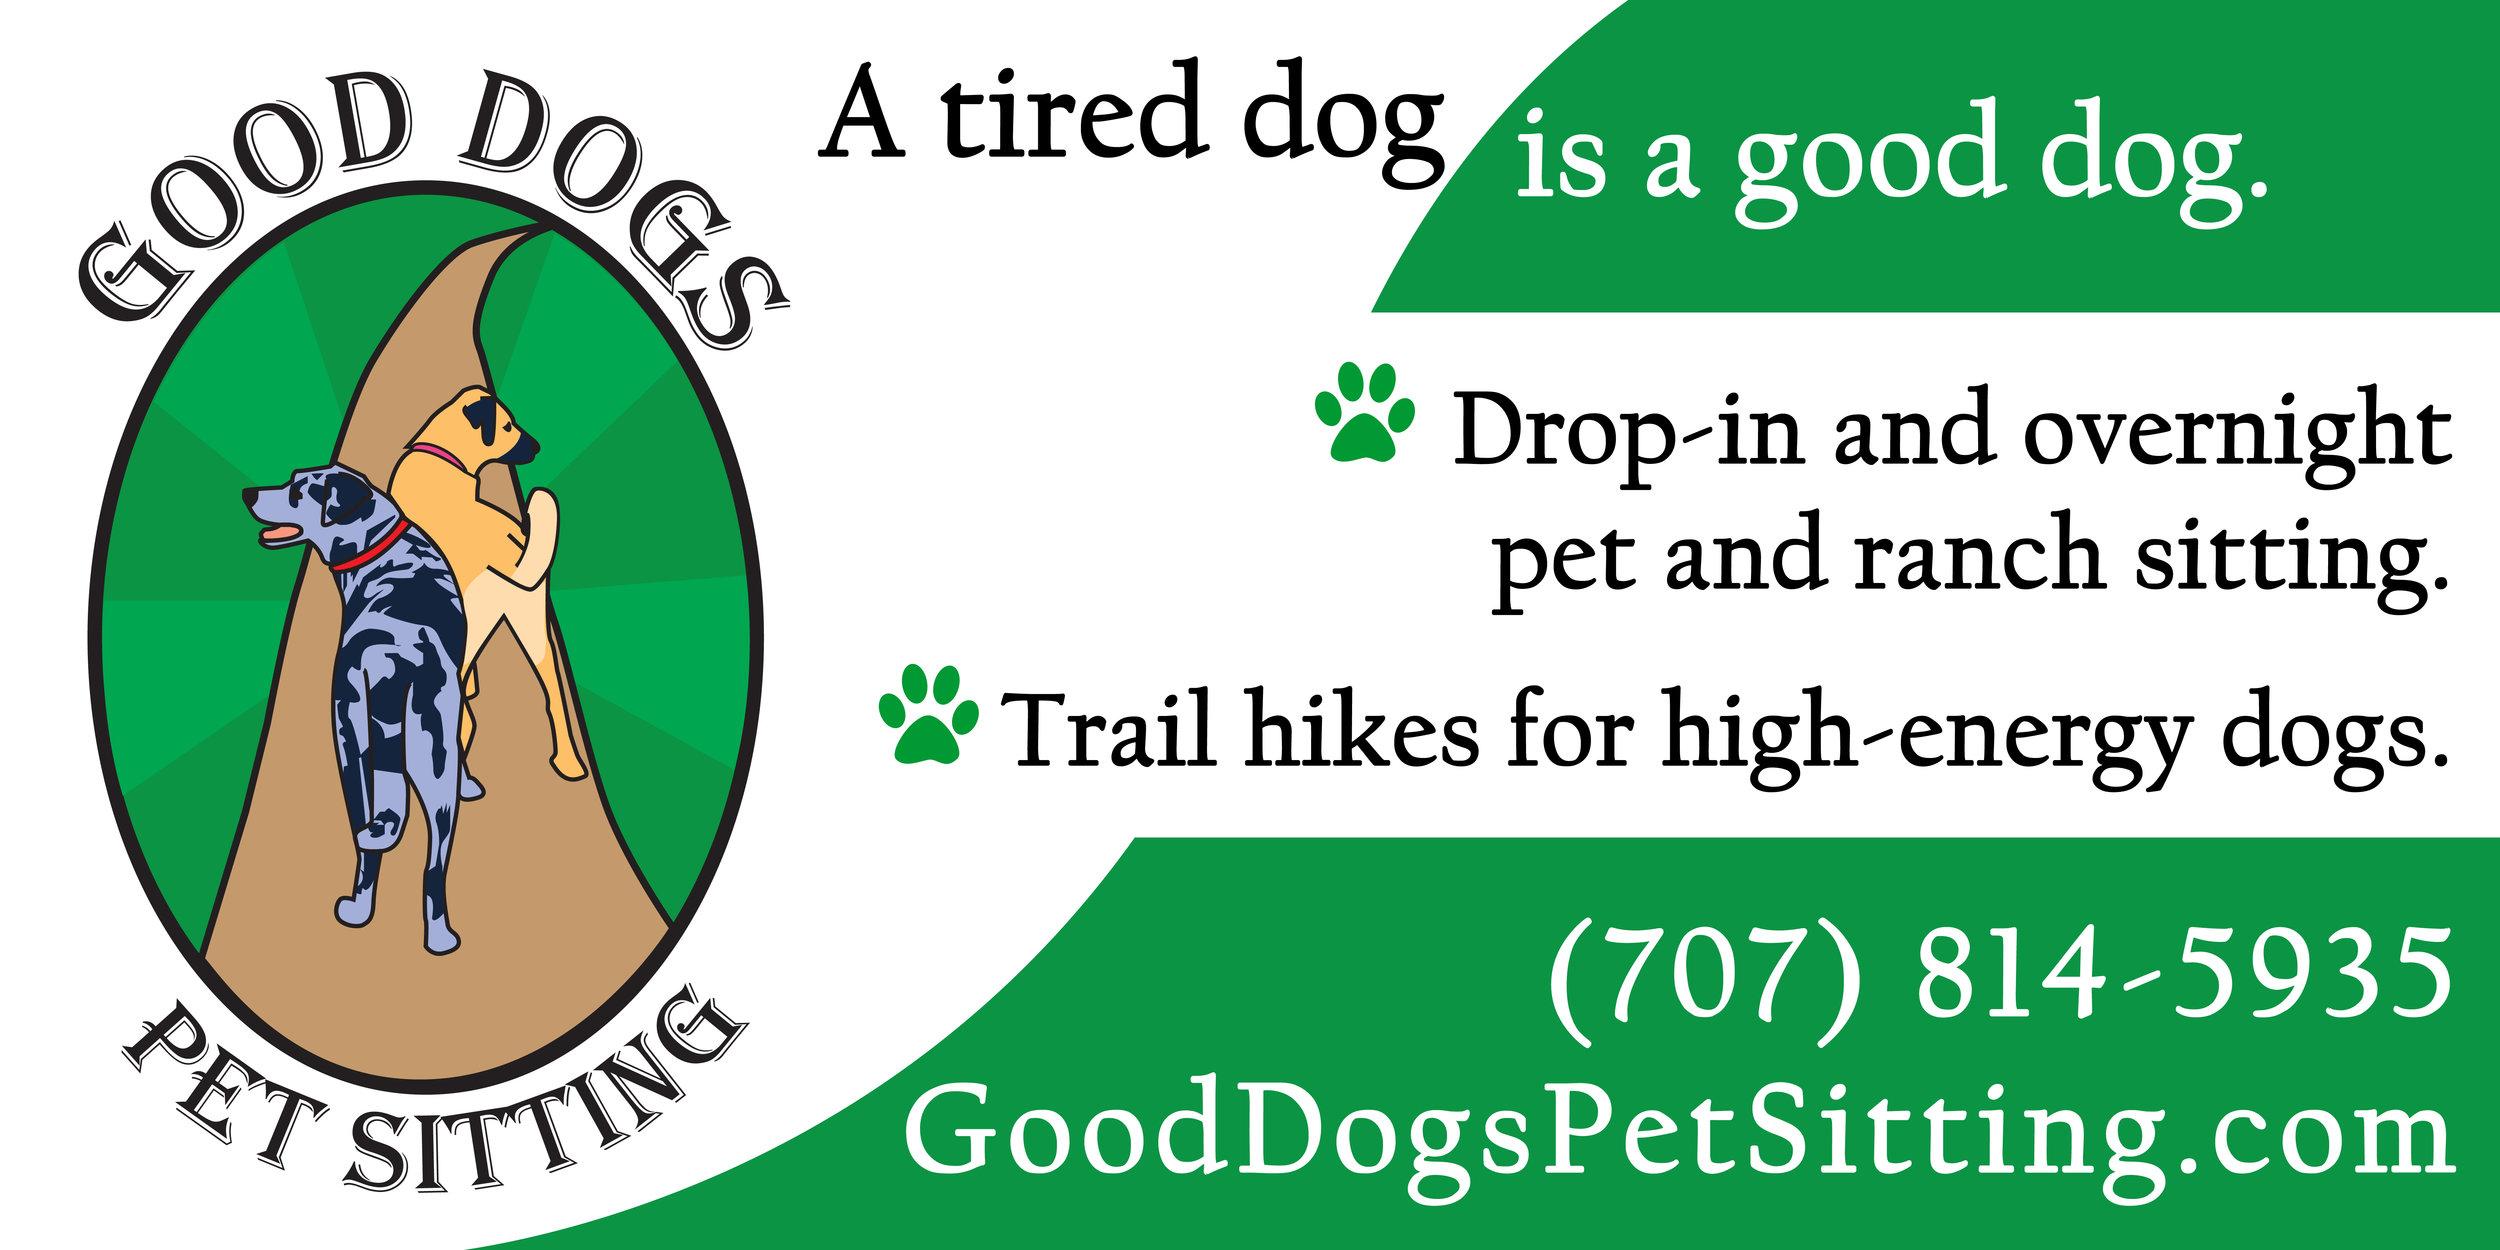 Good Dogs Pet Sitting.jpg